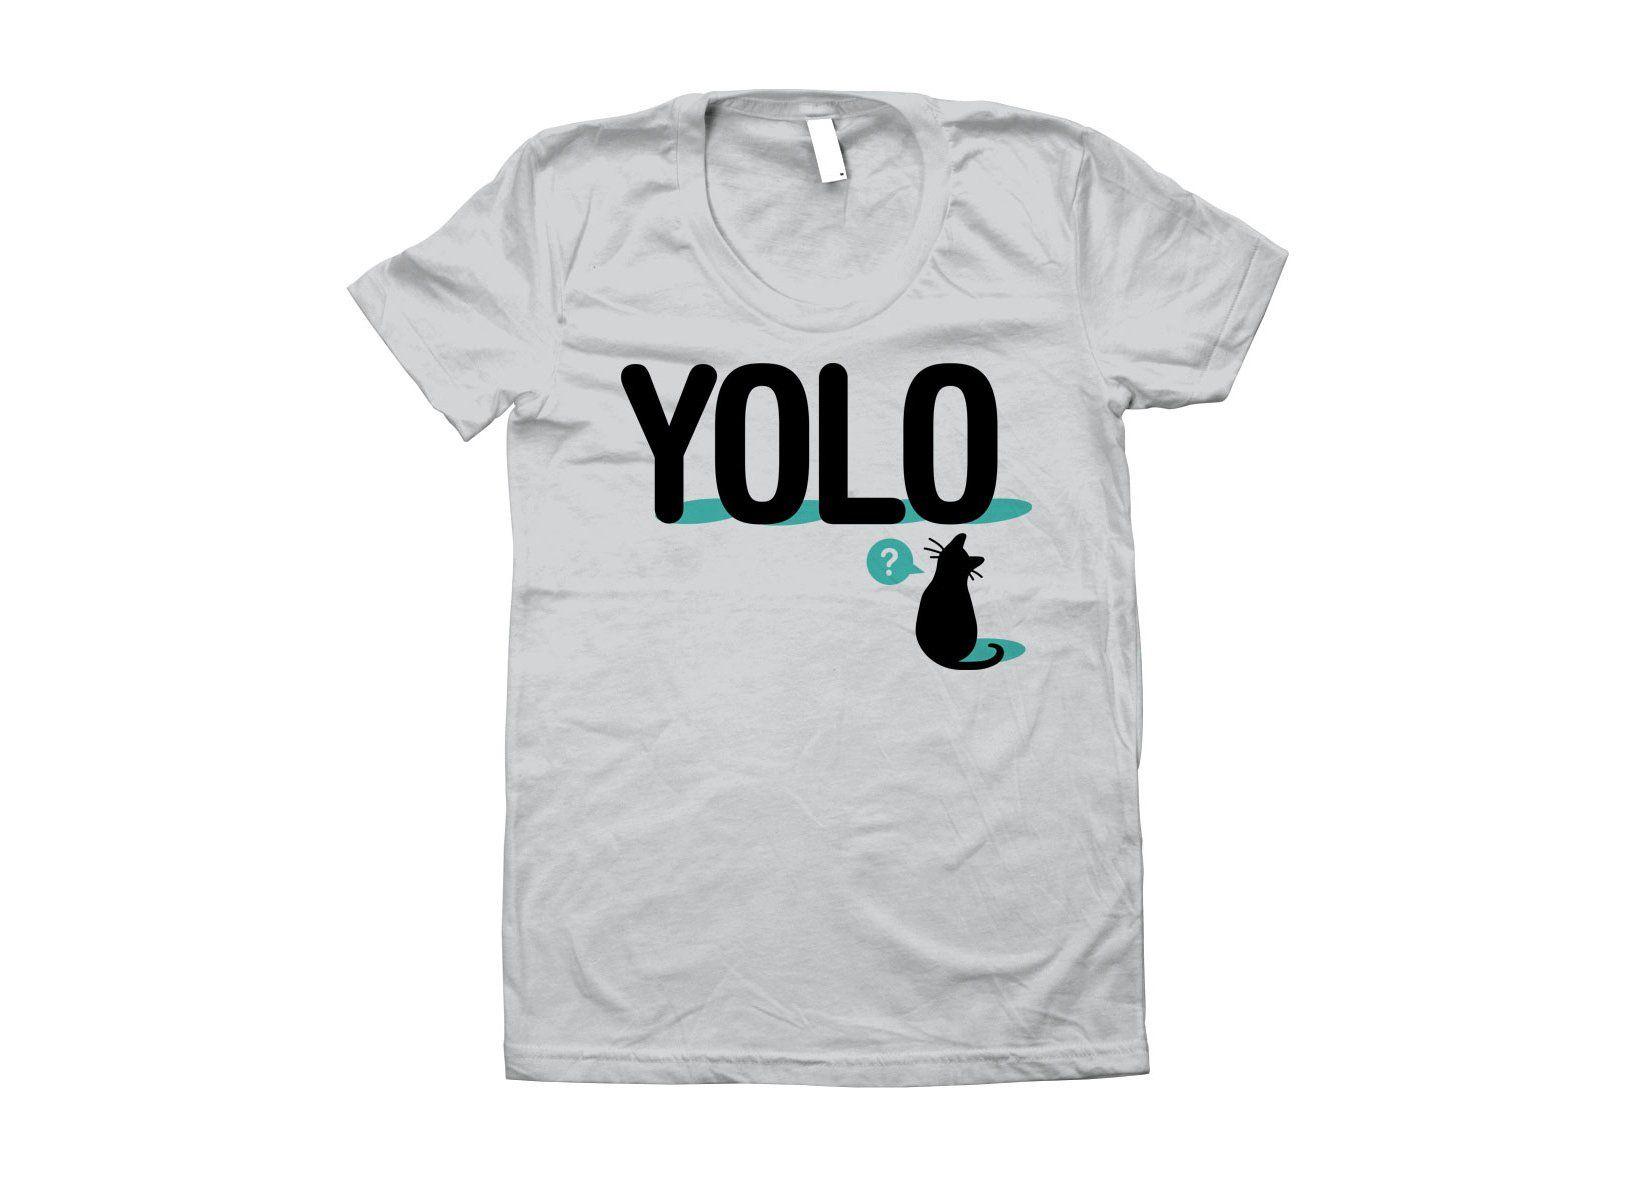 YOLO Cat TShirt Shirts, T shirt, Cats